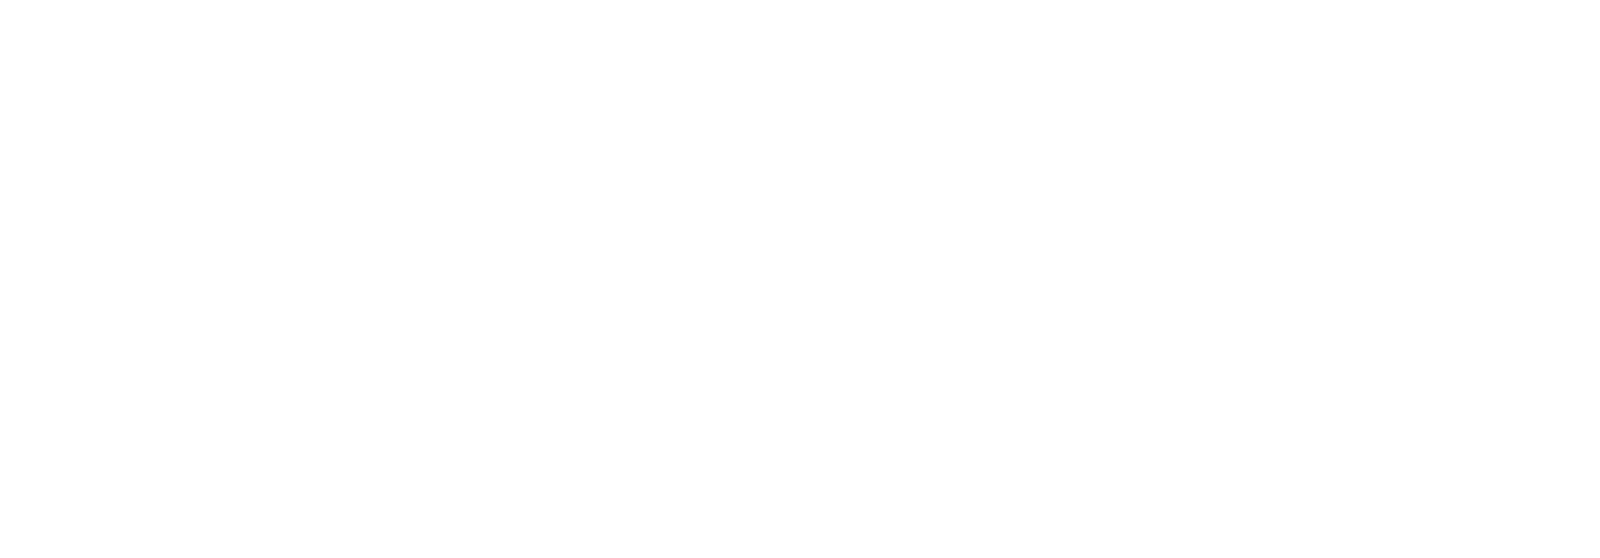 БИТ.СТРО ИТЕЛЬСТВО